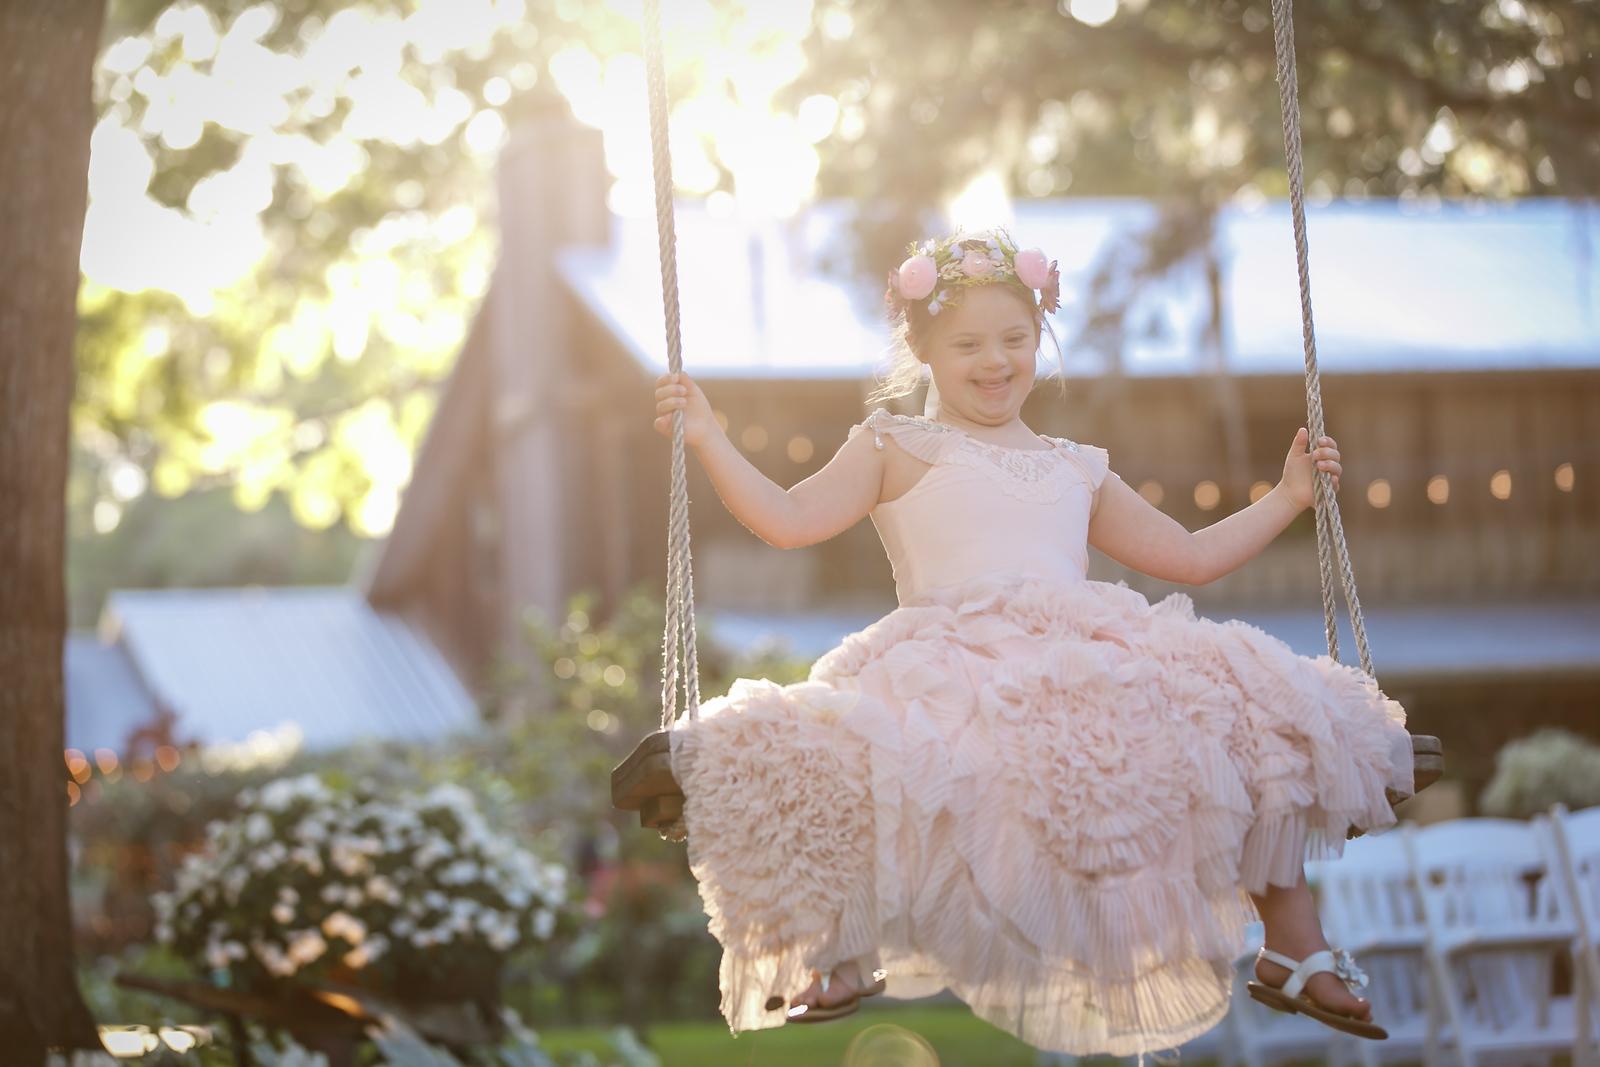 CAP2017-MadisonKyle-WEDDING-Giselle-TuckersFarmhouse-1035